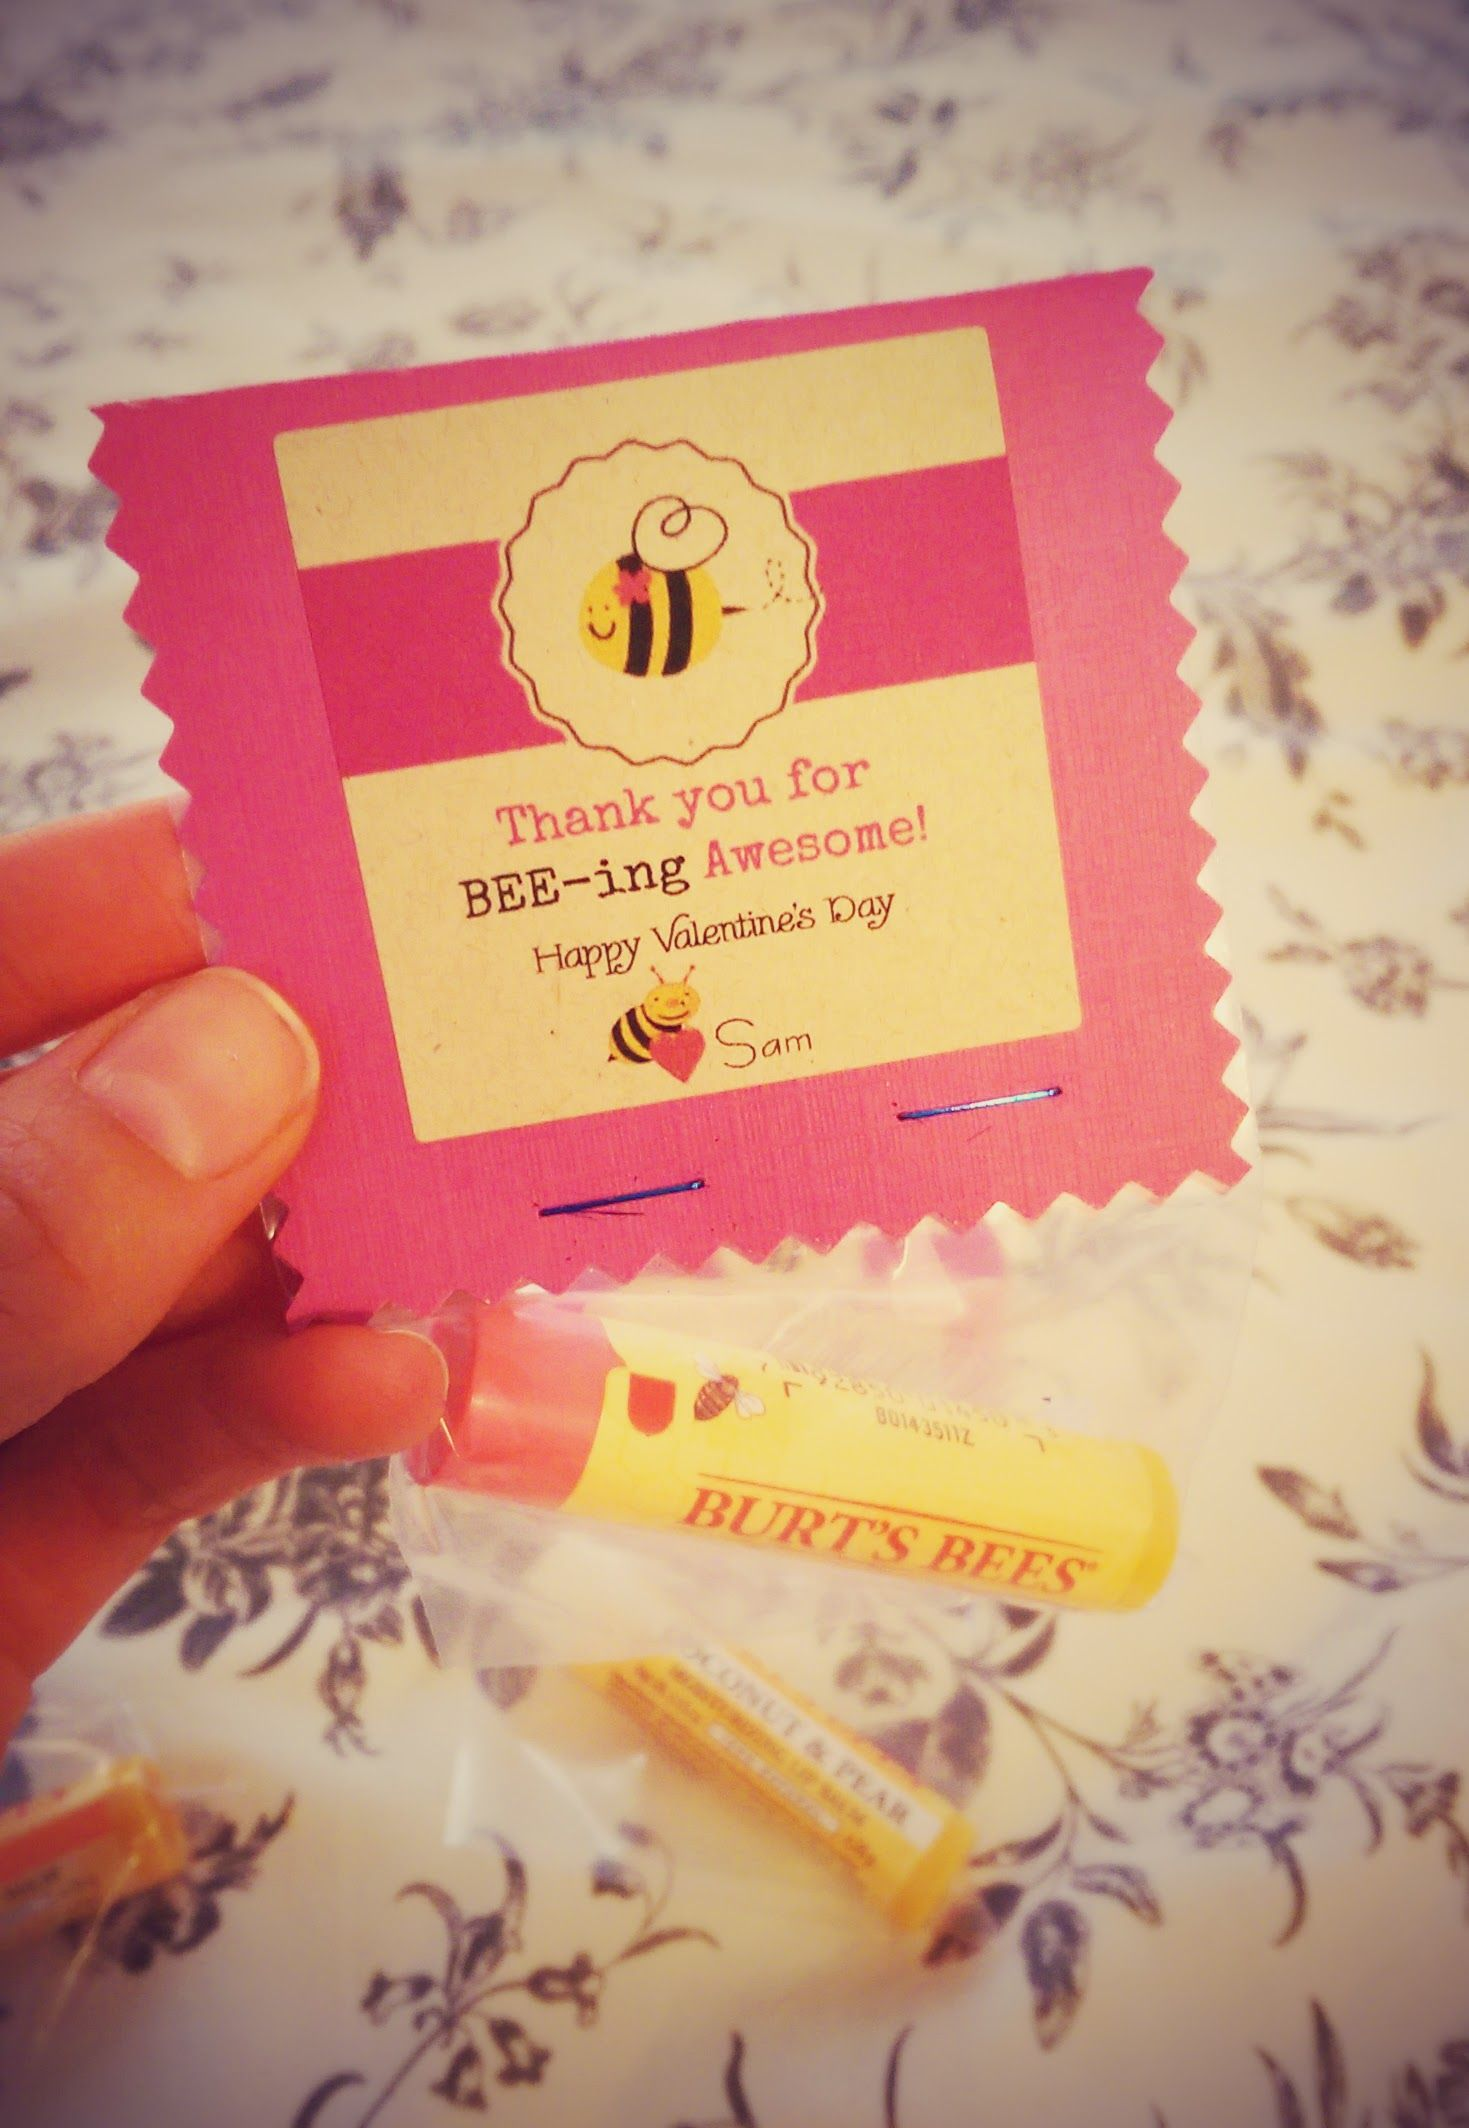 Another Quick Diy Valentine Burt S Bees Valentines Gift Card Valentine Gifts For Kids Bee Valentine